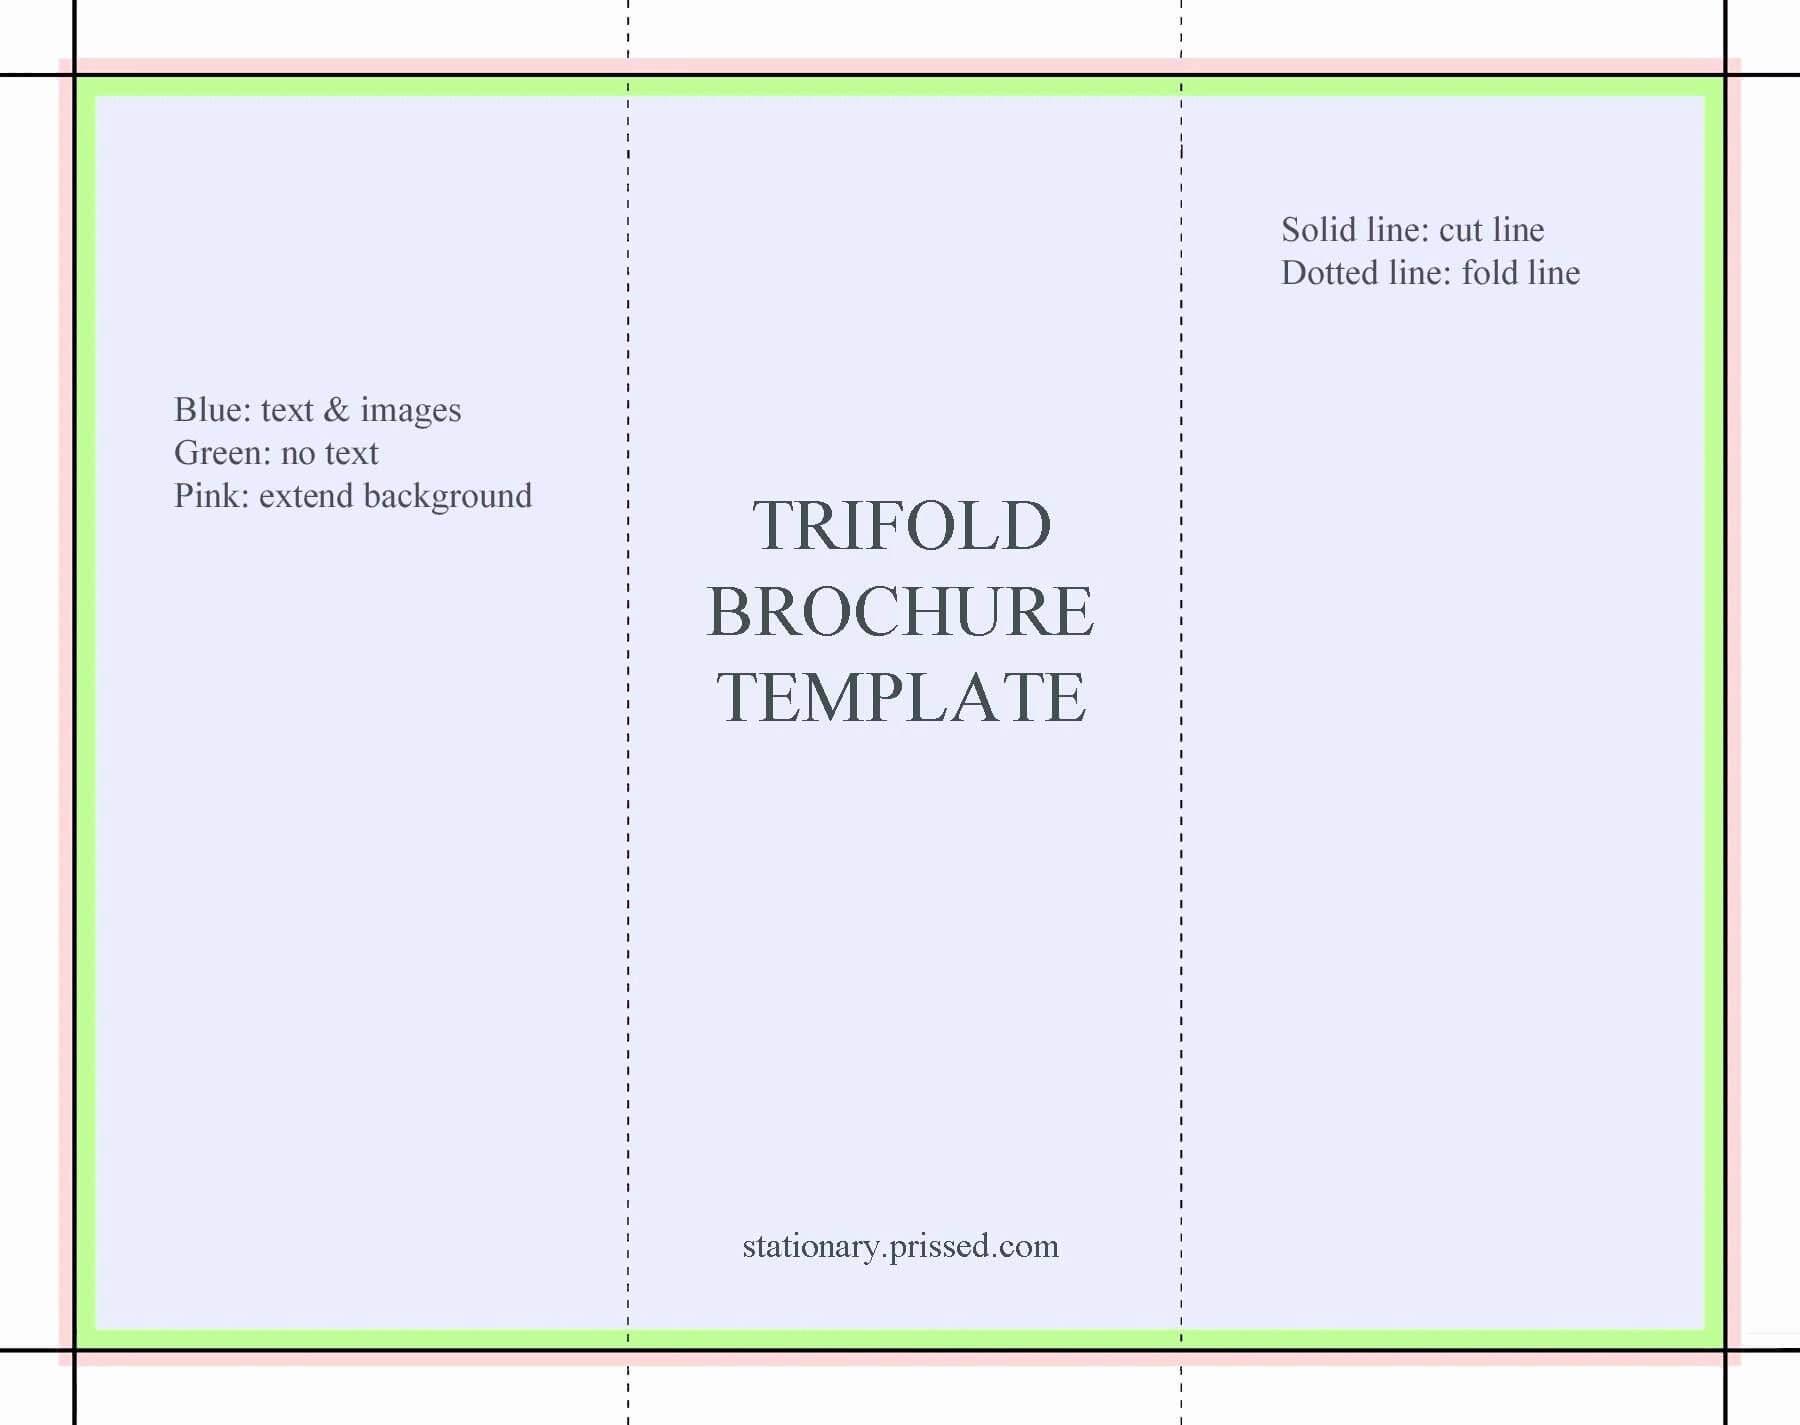 007 Template Ideas Google Docs Brochure Panel Pertaining To Within Google Docs Tri Fold Brochure Template